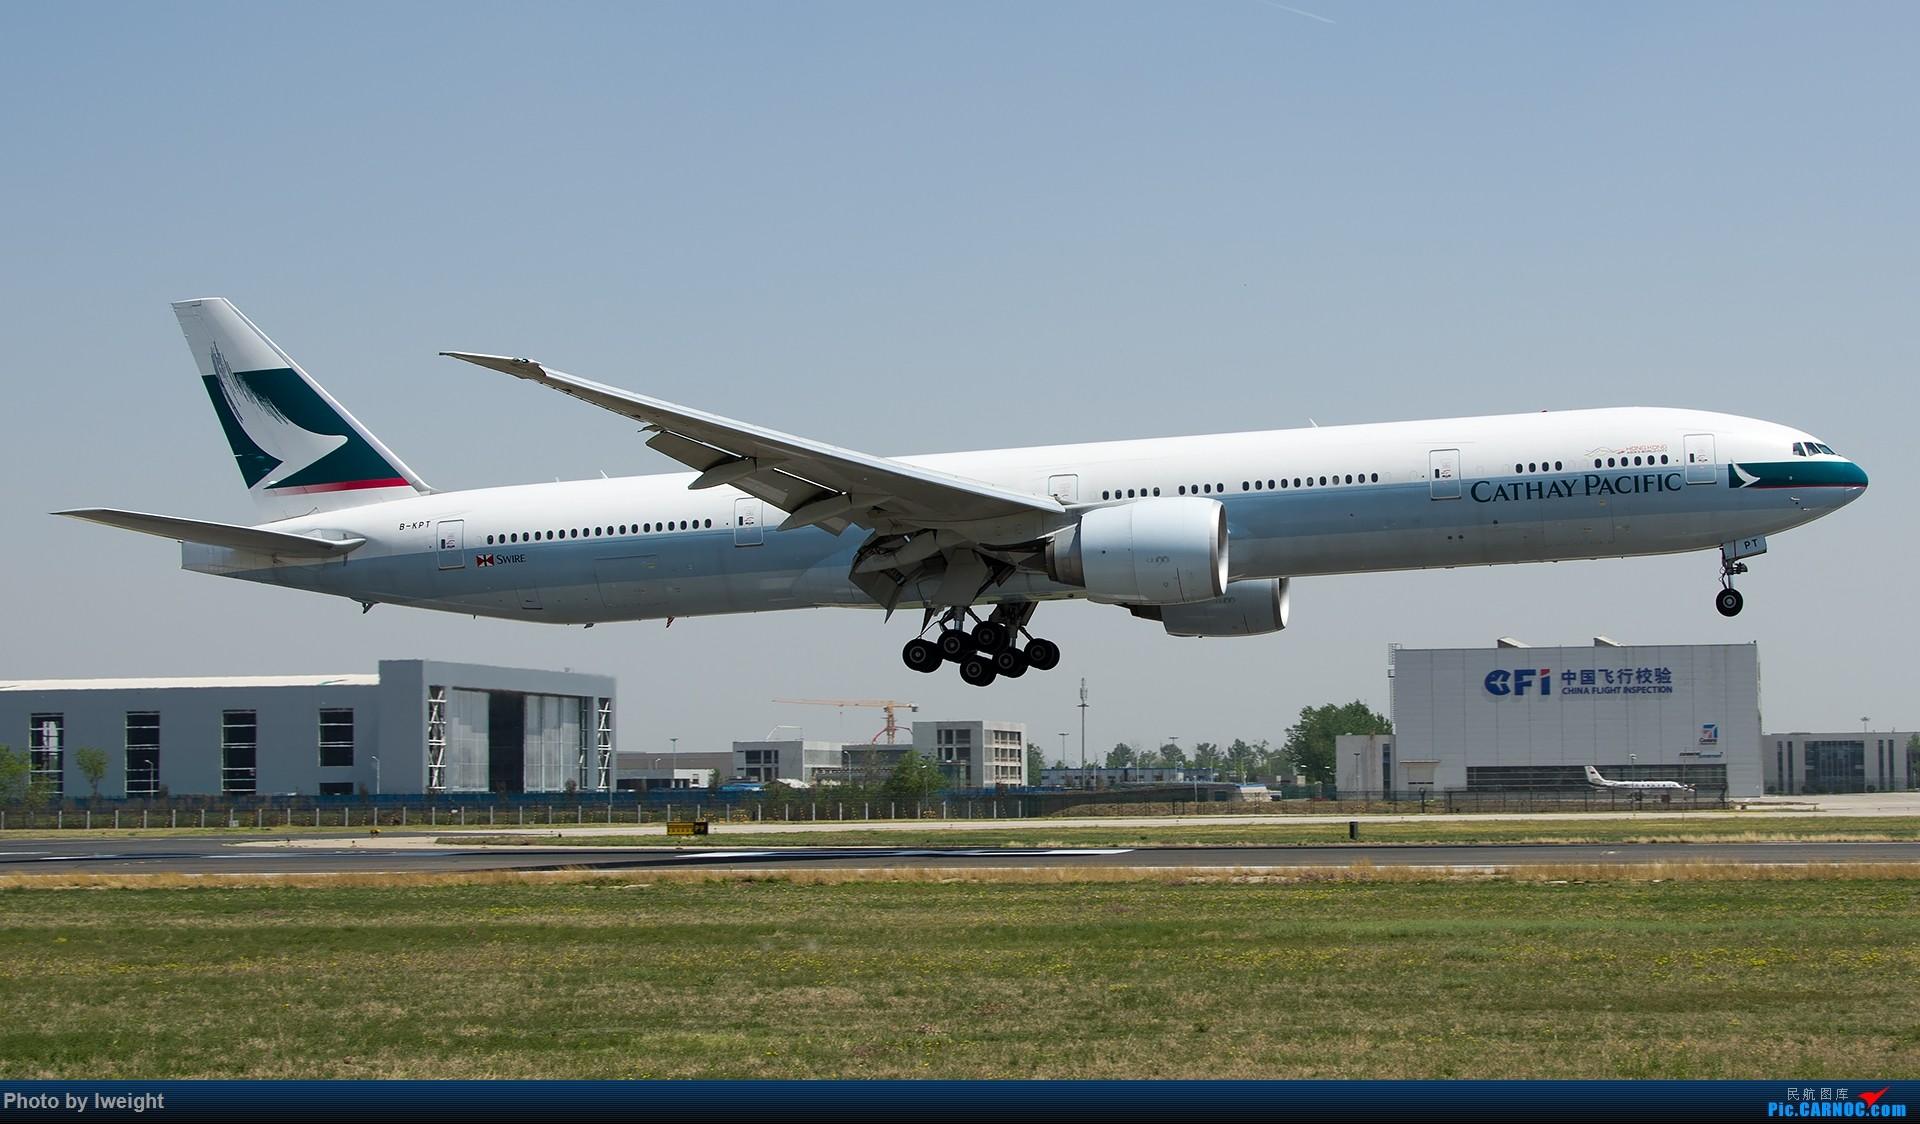 Re:[原创]2015年第一次在PEK拍北向南,其实是为Jimmy去的【2015-4-24】 BOEING 777-300ER B-KPT 中国北京首都国际机场